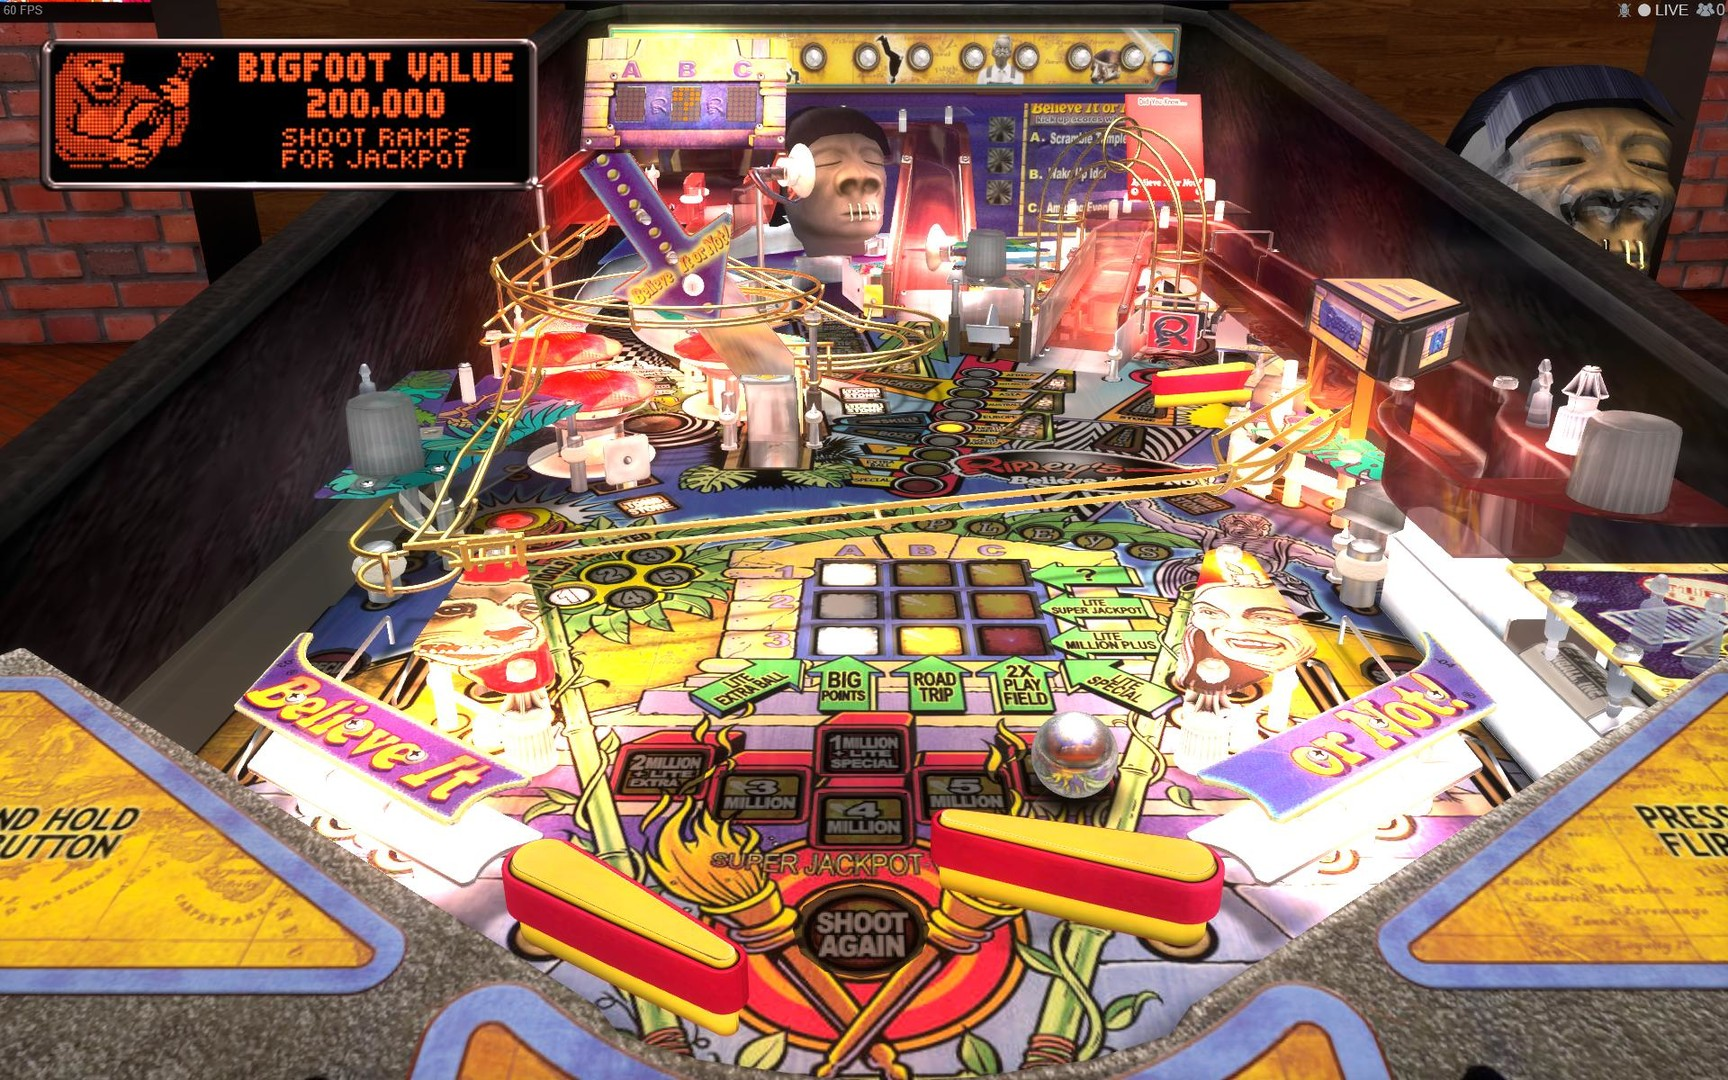 Stern Pinball Arcade: Ripley's Believe It Or Not!